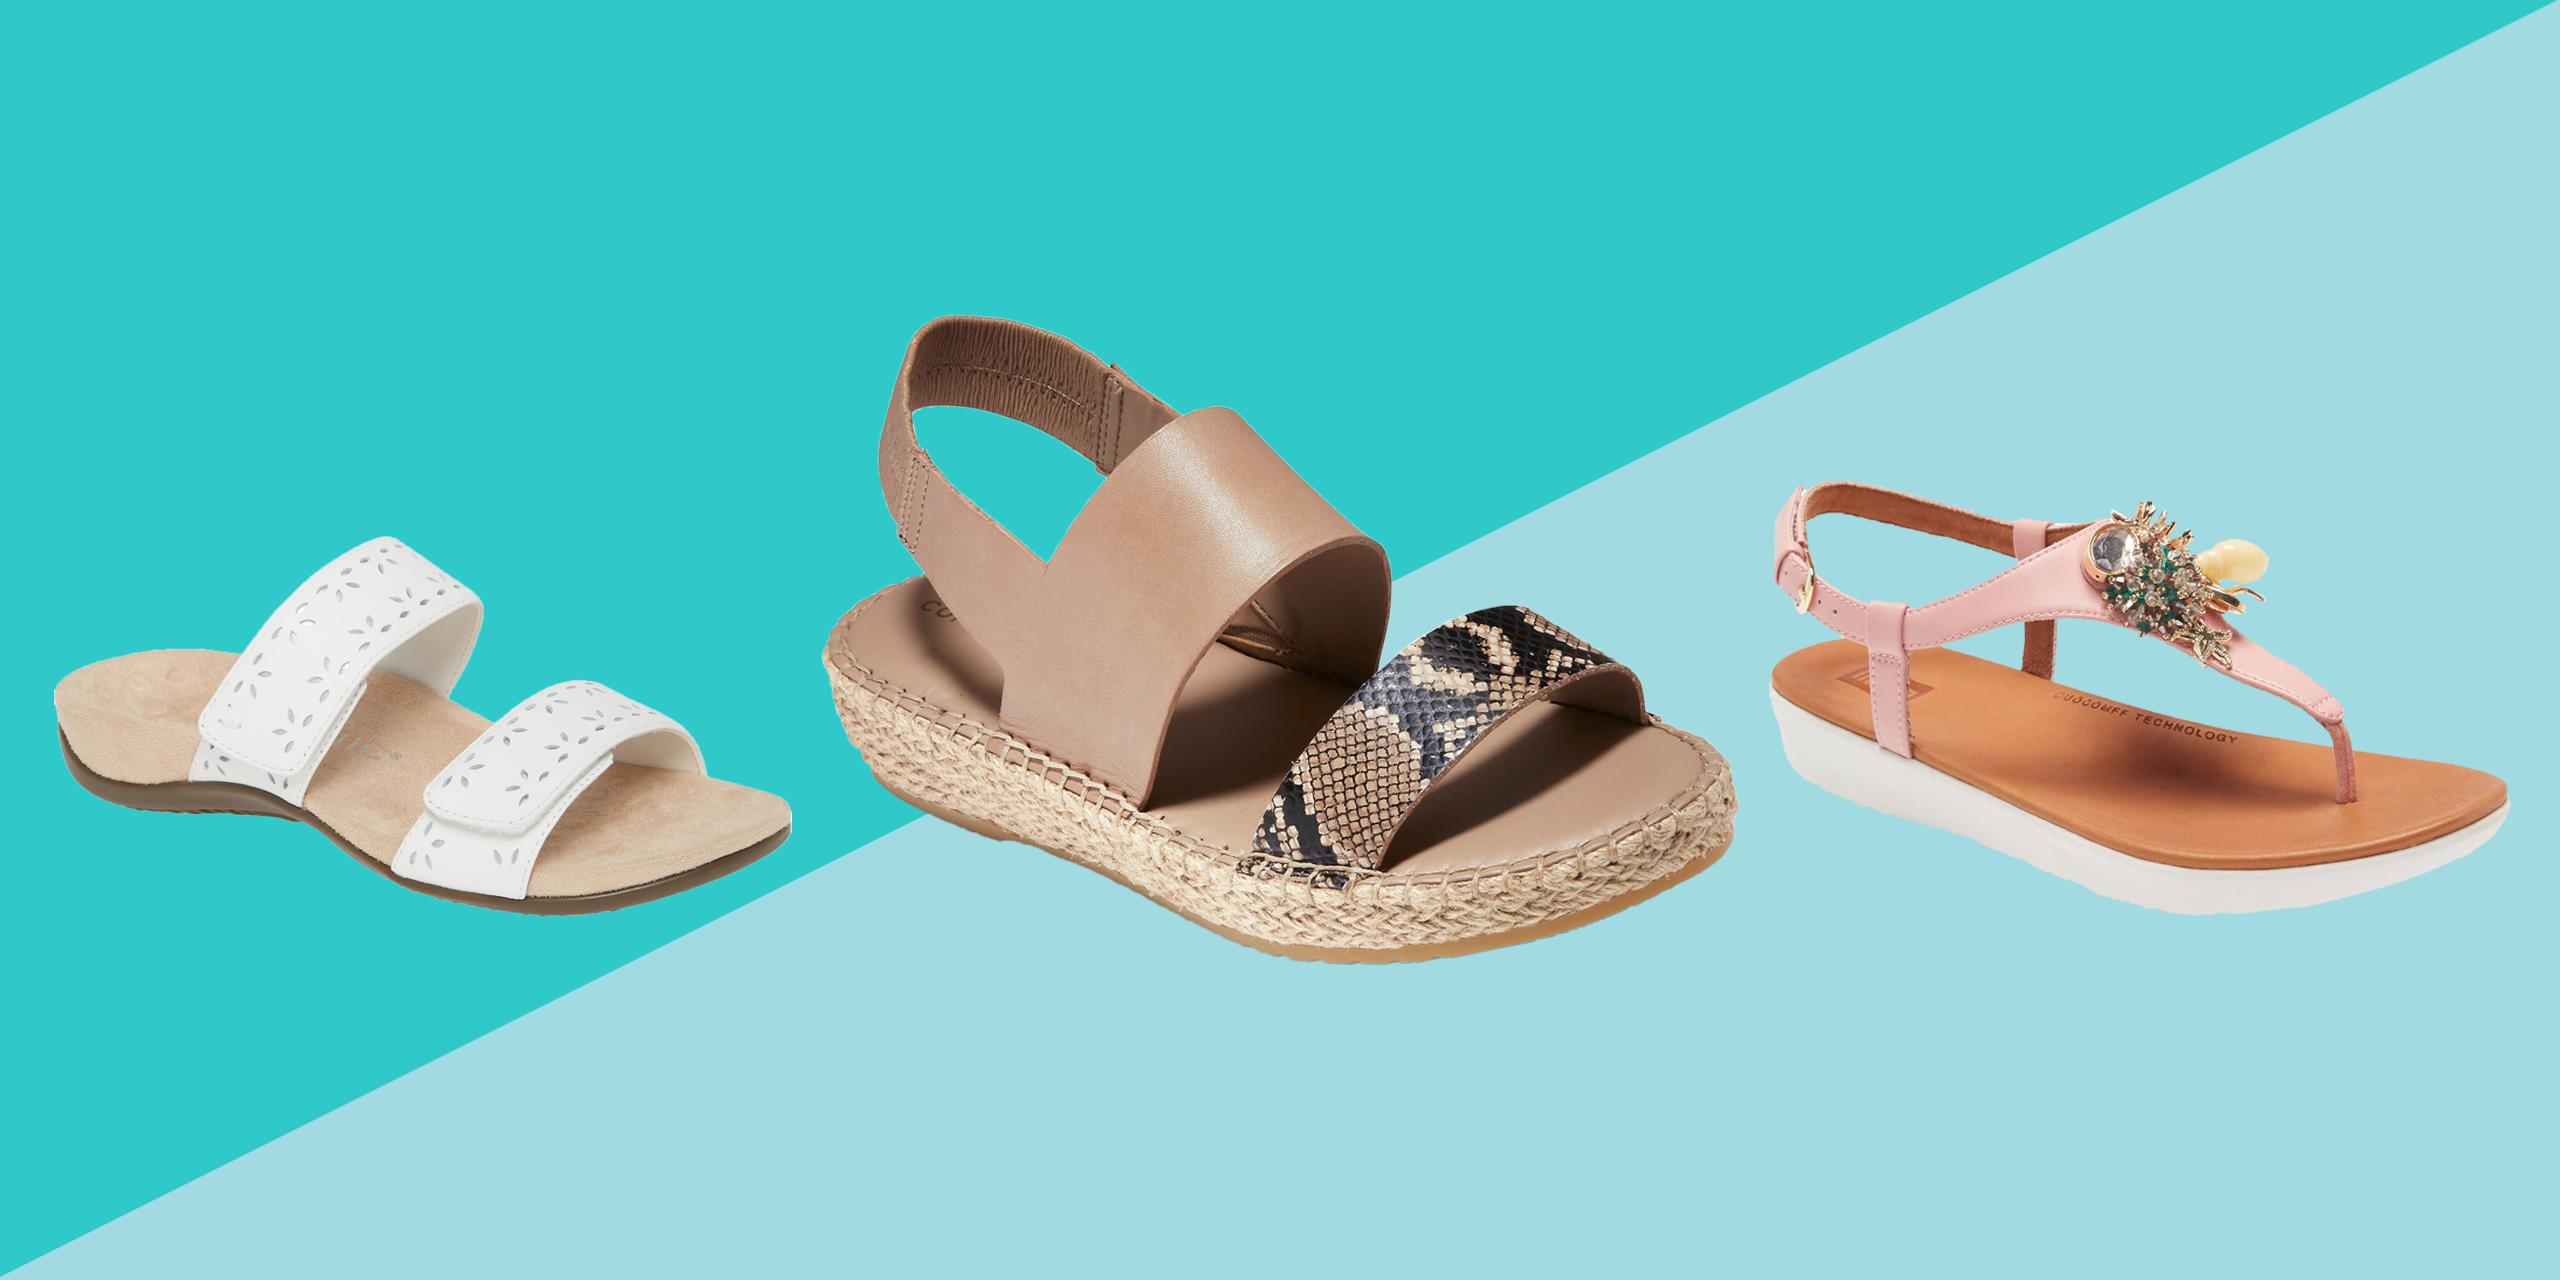 15 Best Walking Sandals for 2020